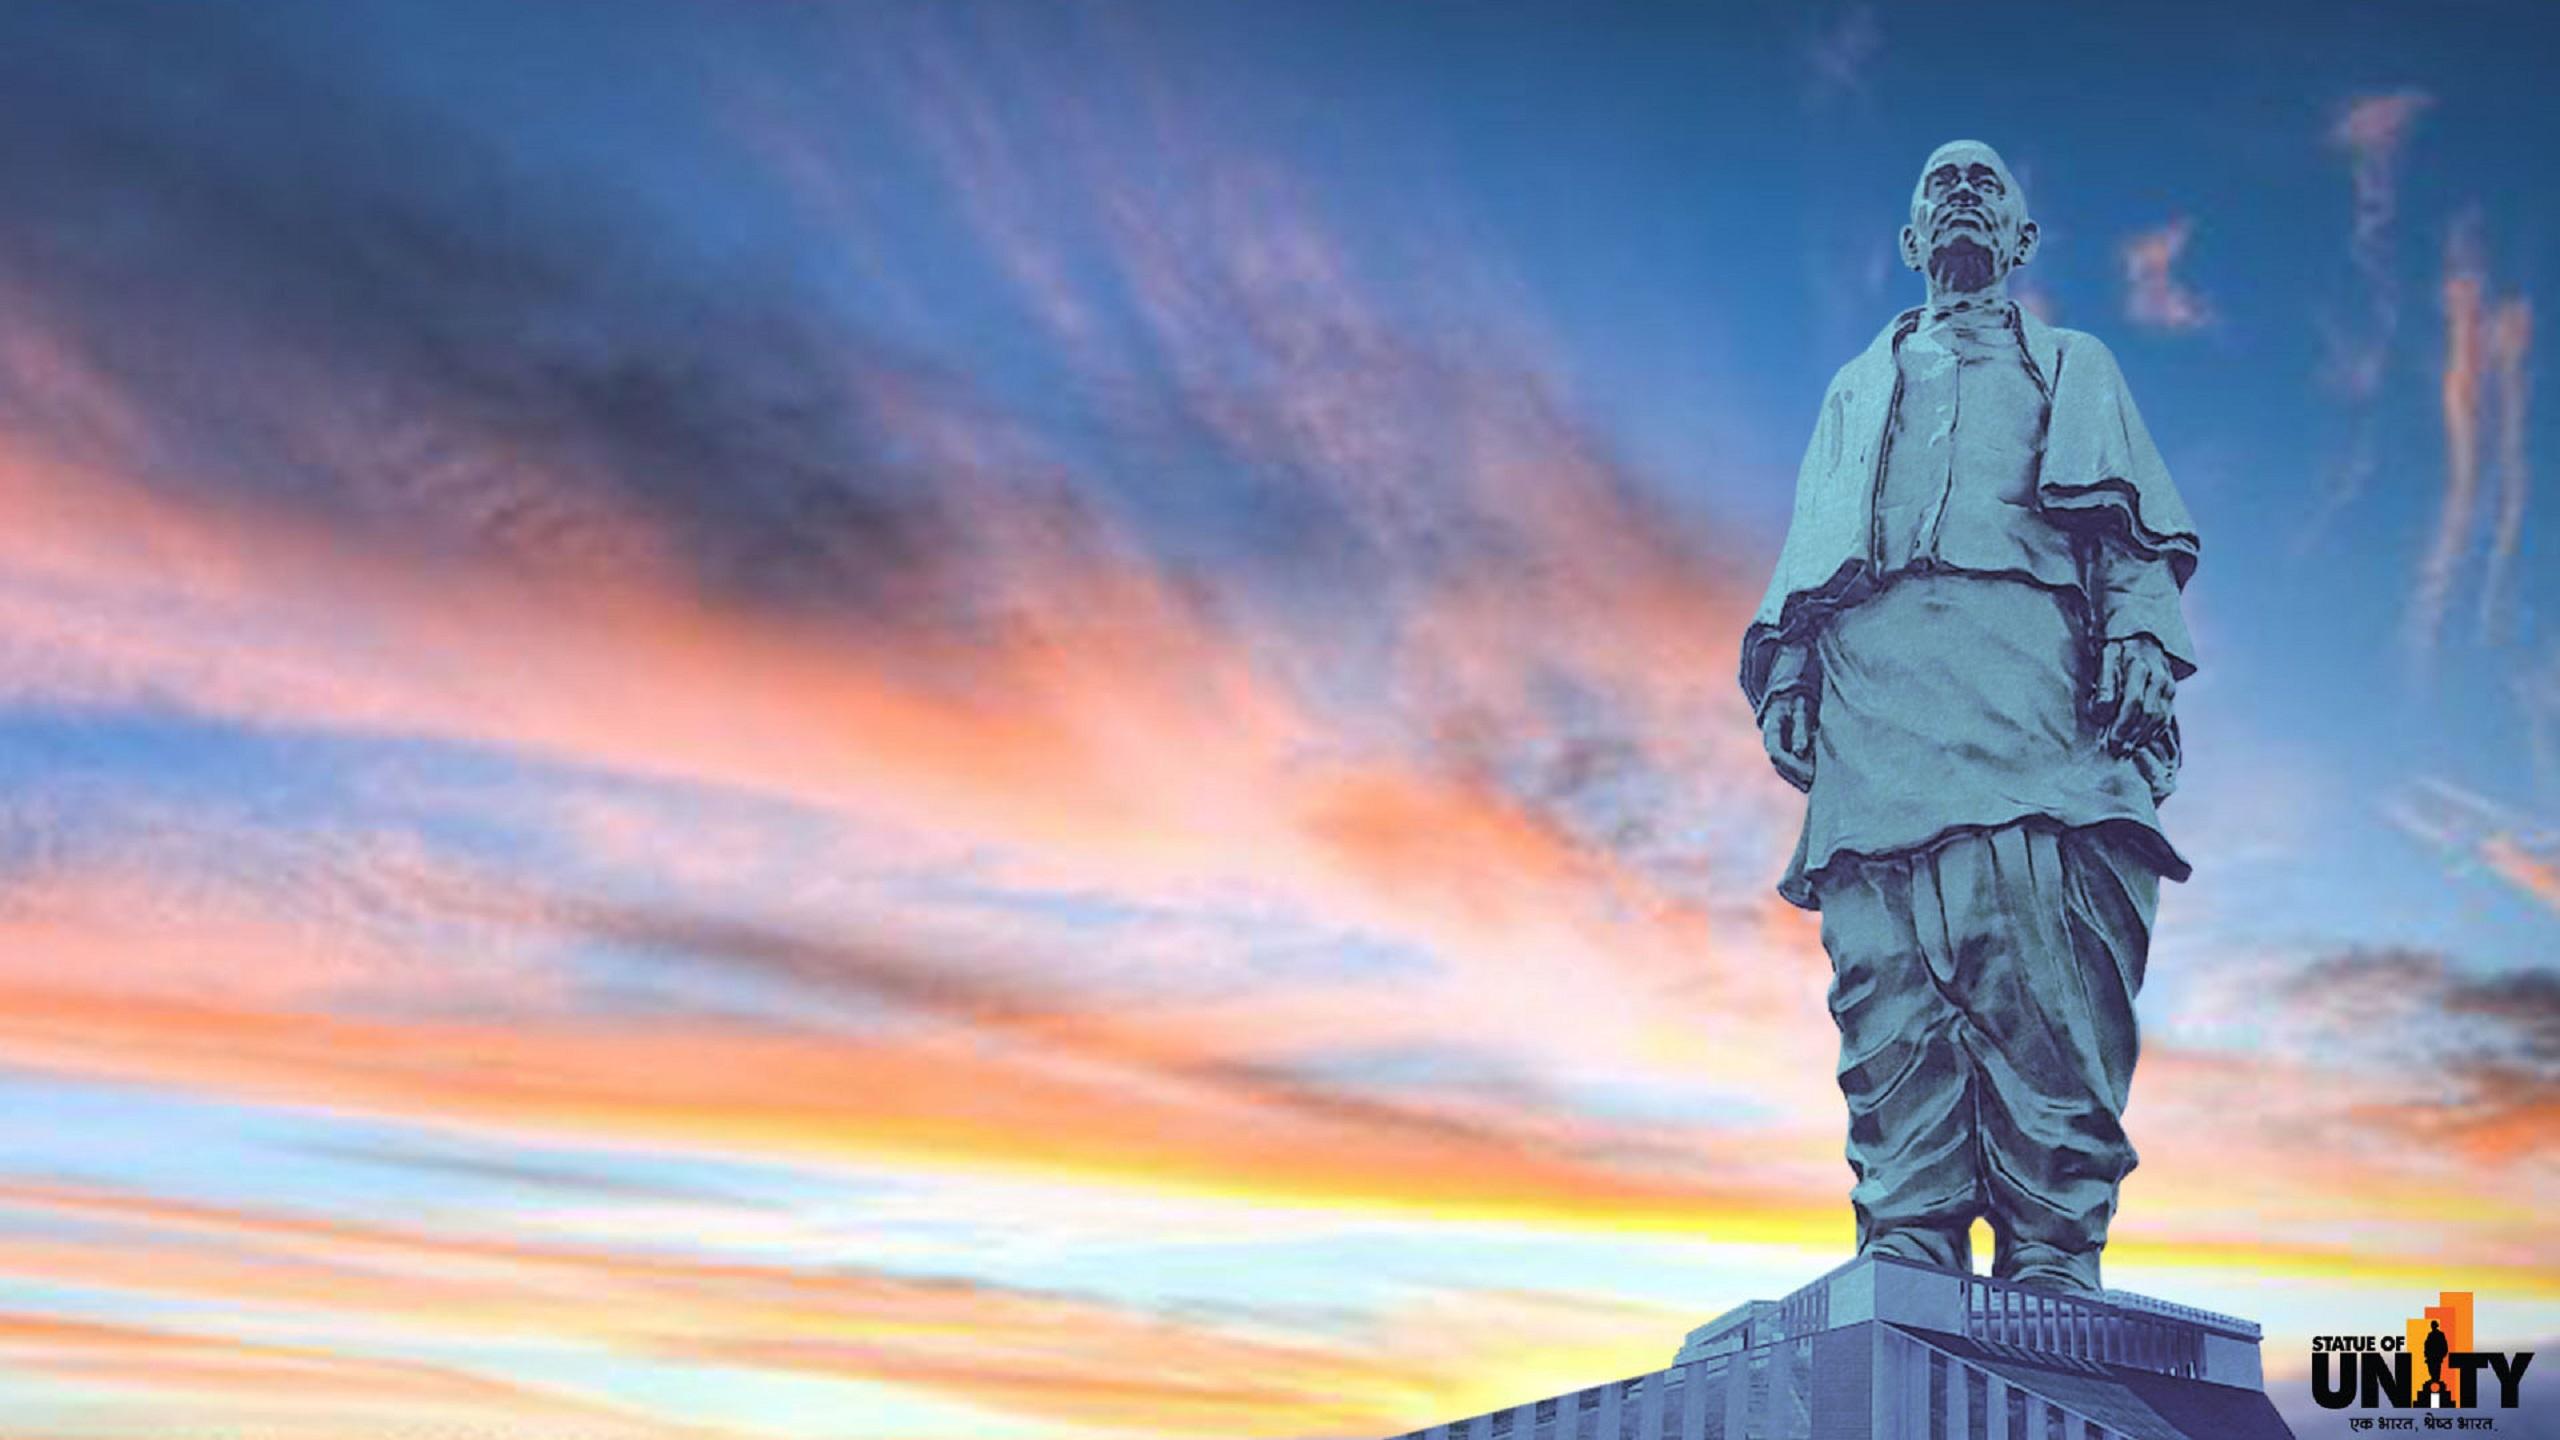 Sardar Statue Image